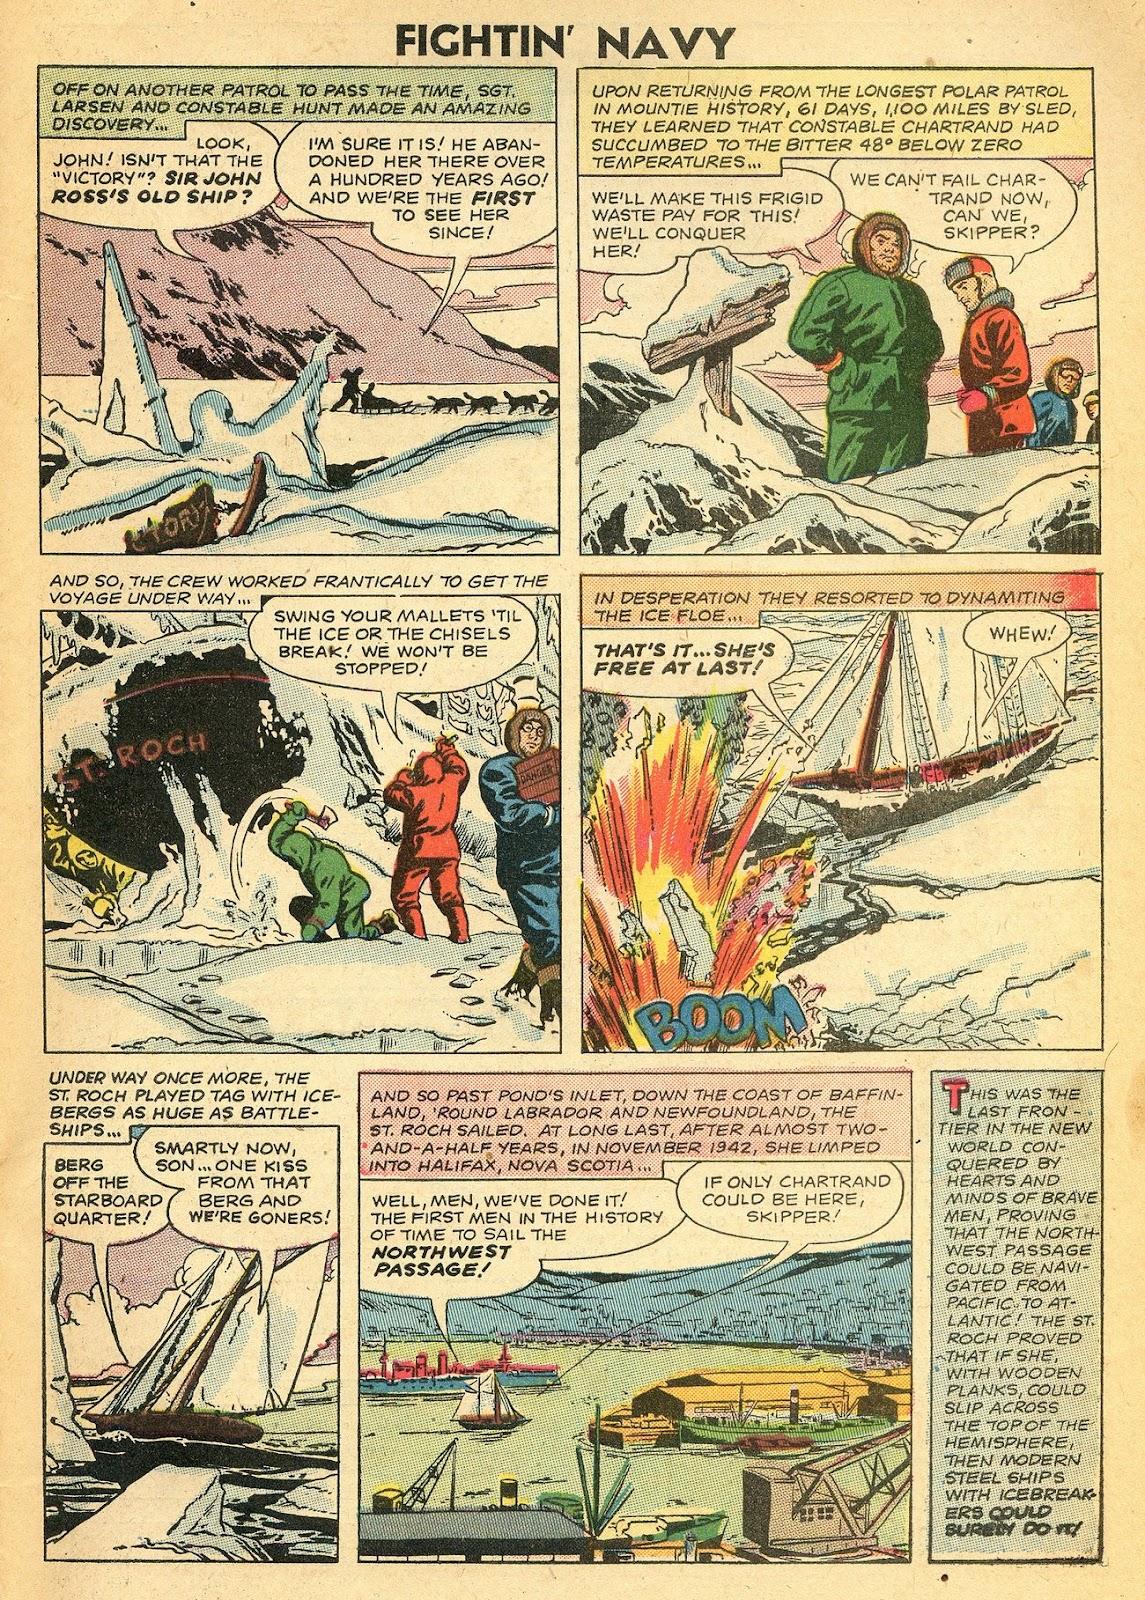 Read online Fightin' Navy comic -  Issue #77 - 33